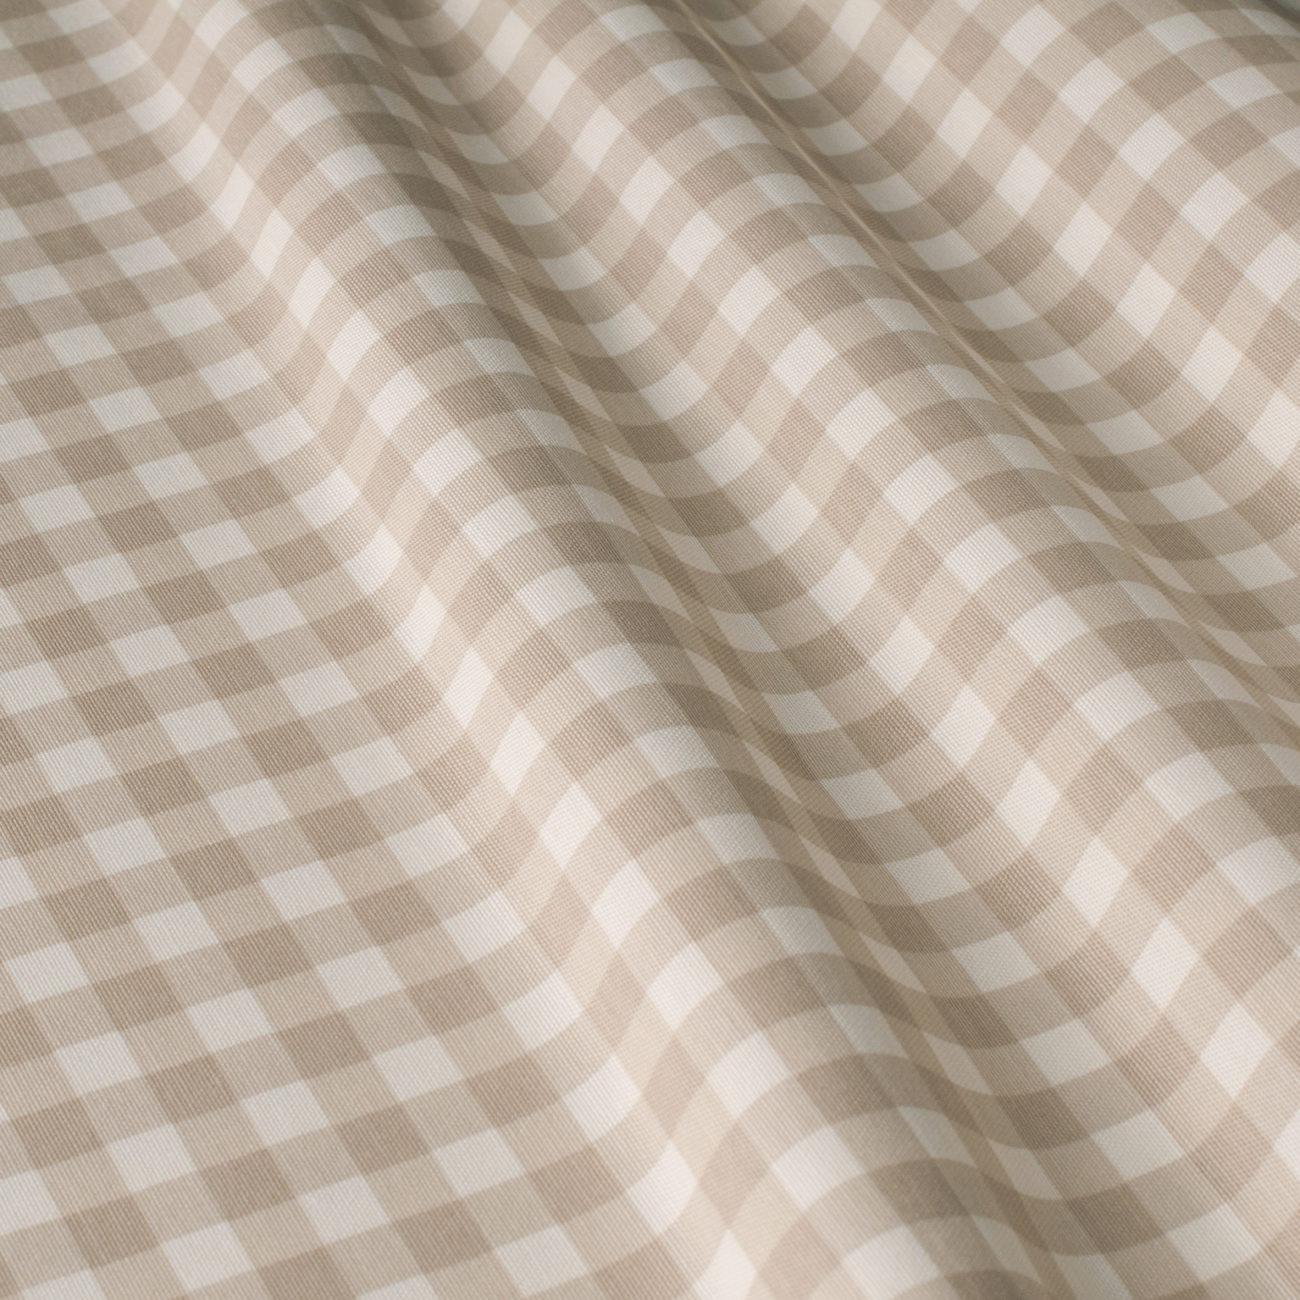 Mantel BISTROTBEIGE Cuadrícula1,3cm Rectangular 1,5x2,4m [enstockpara envíooretiro]